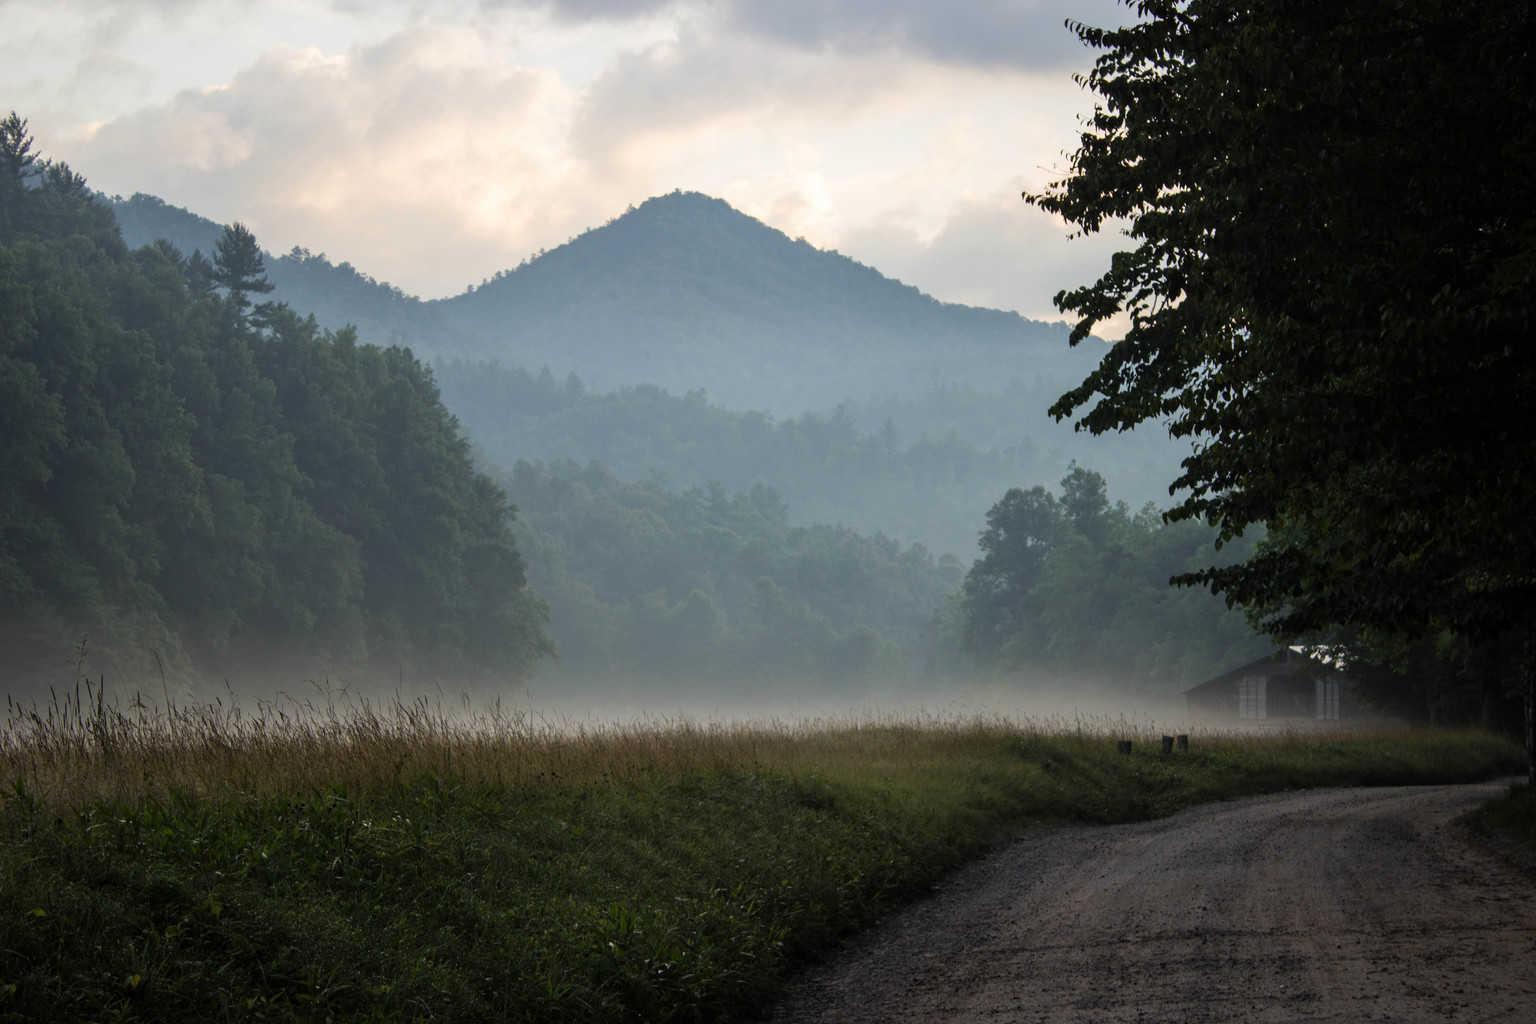 cataloochee valley smoky mountains road trip